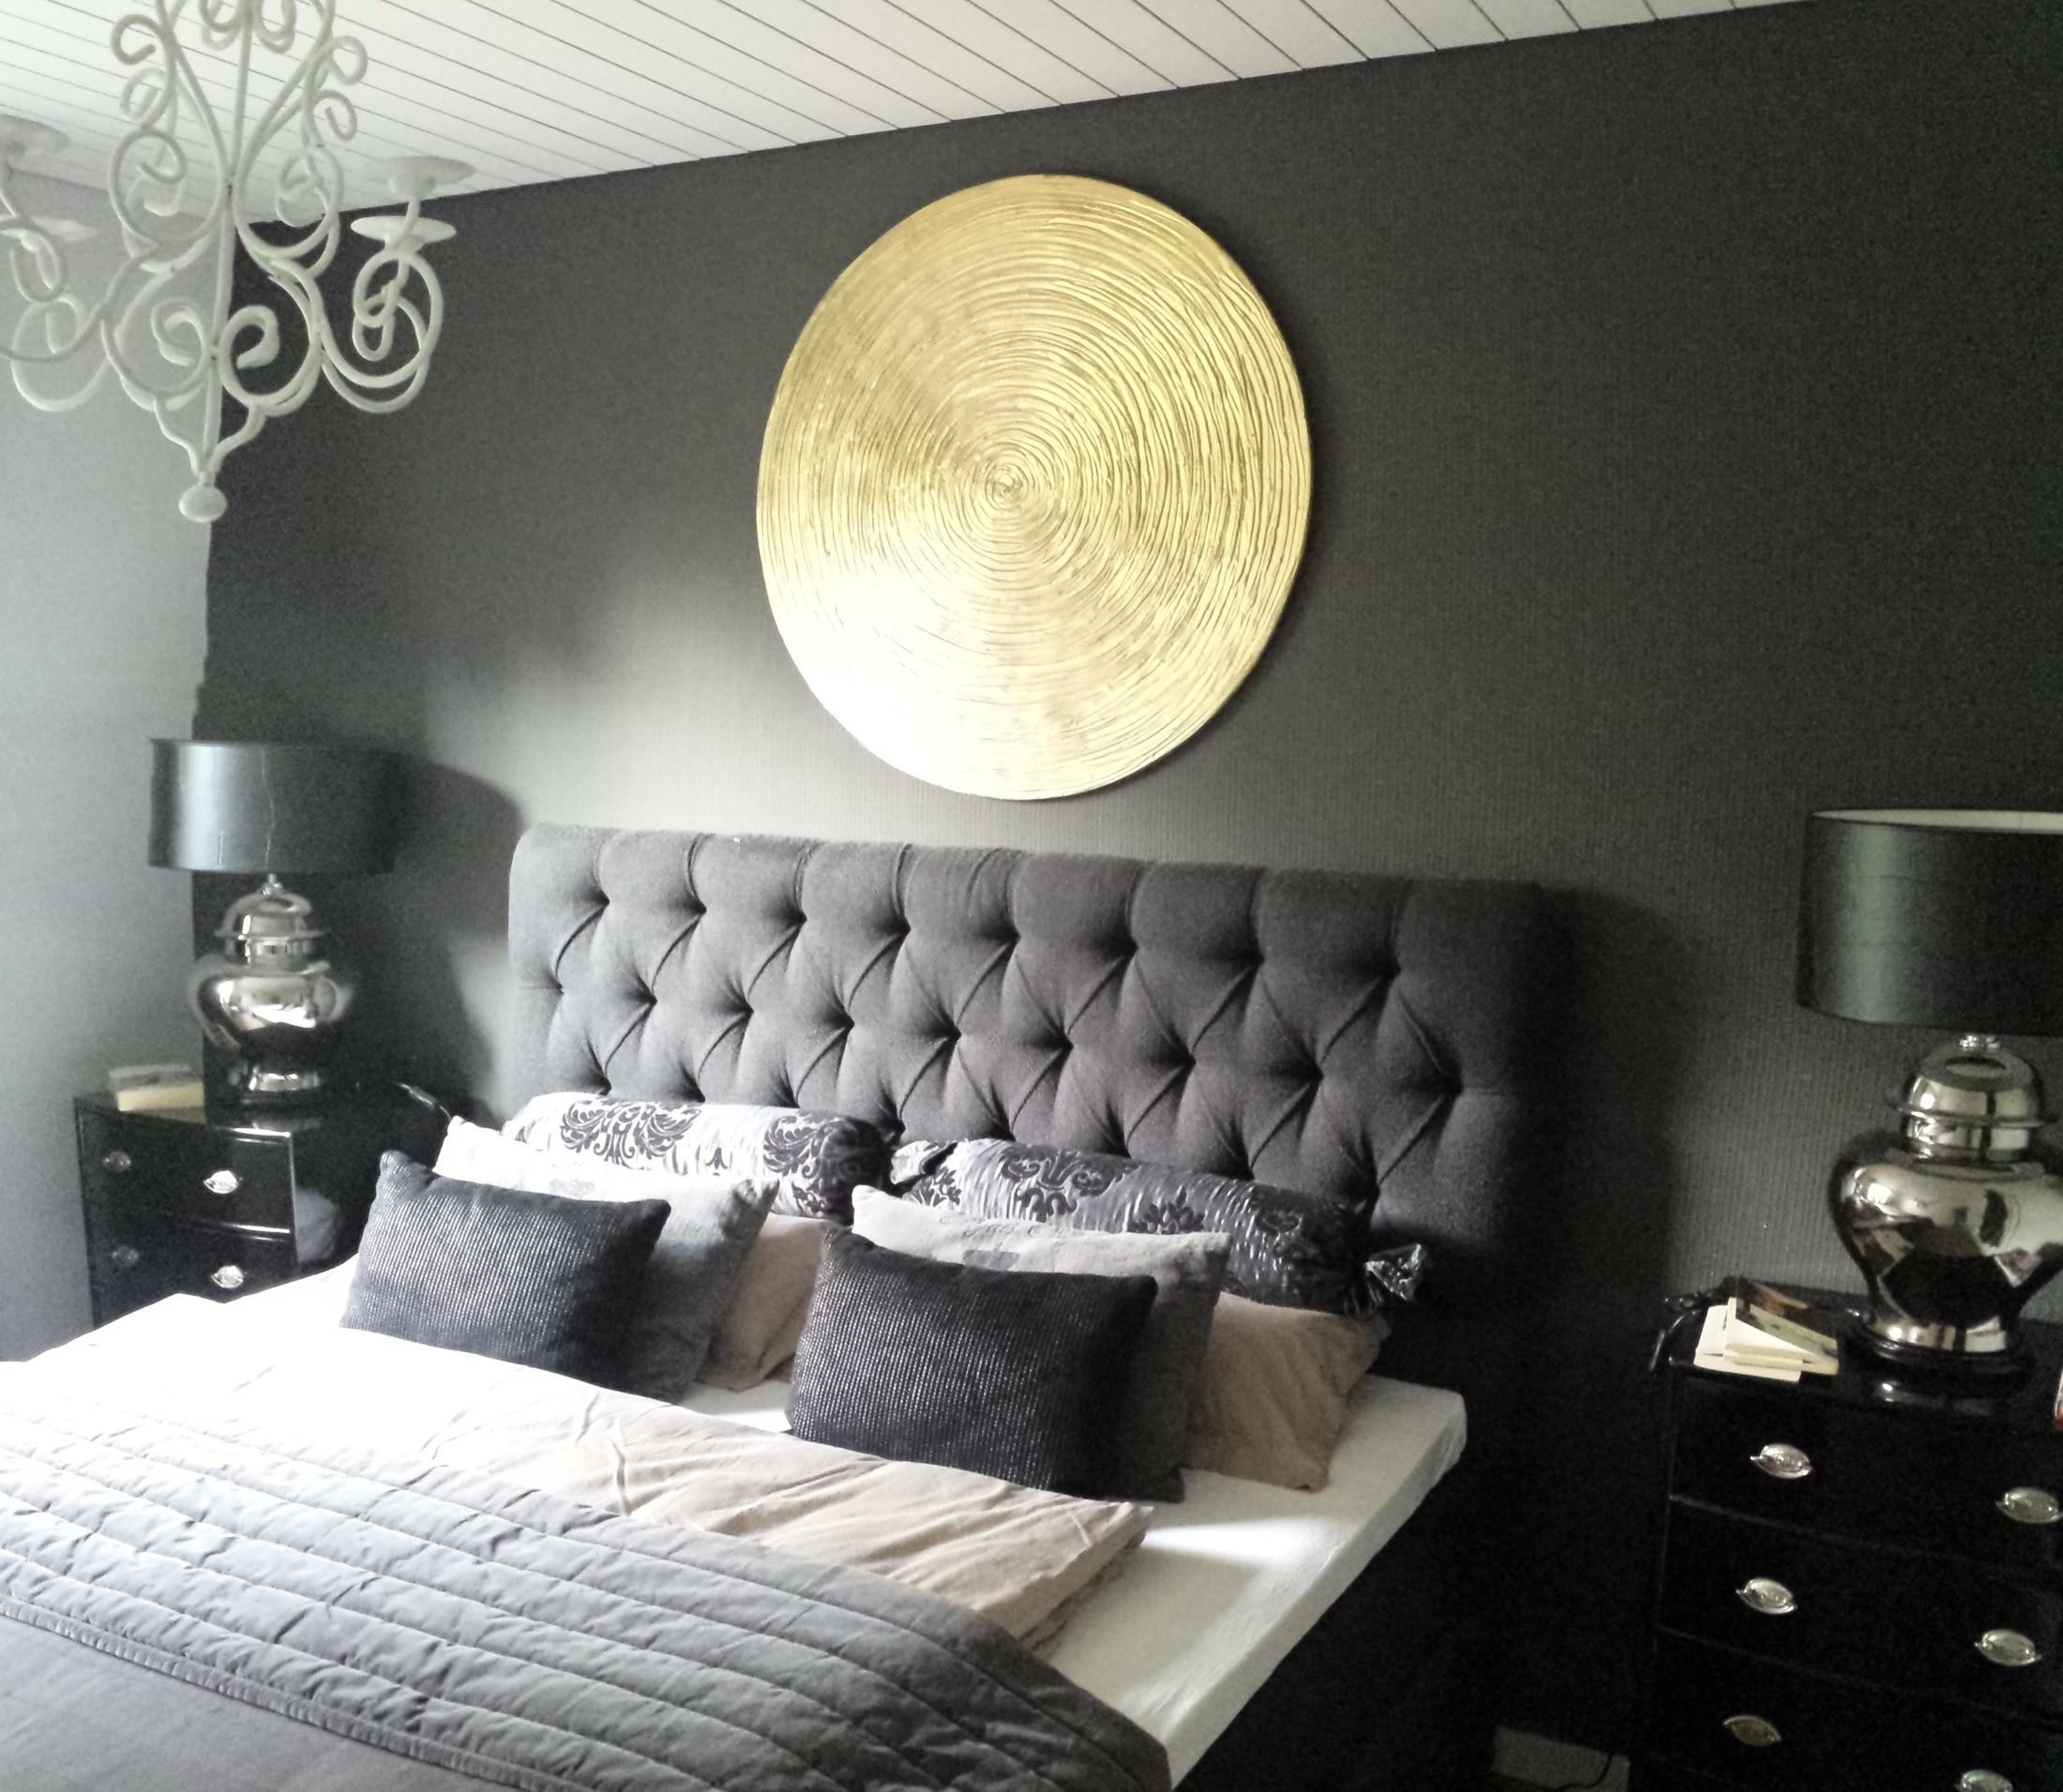 einzigartiges mit stil rundes design objekt by atelier. Black Bedroom Furniture Sets. Home Design Ideas